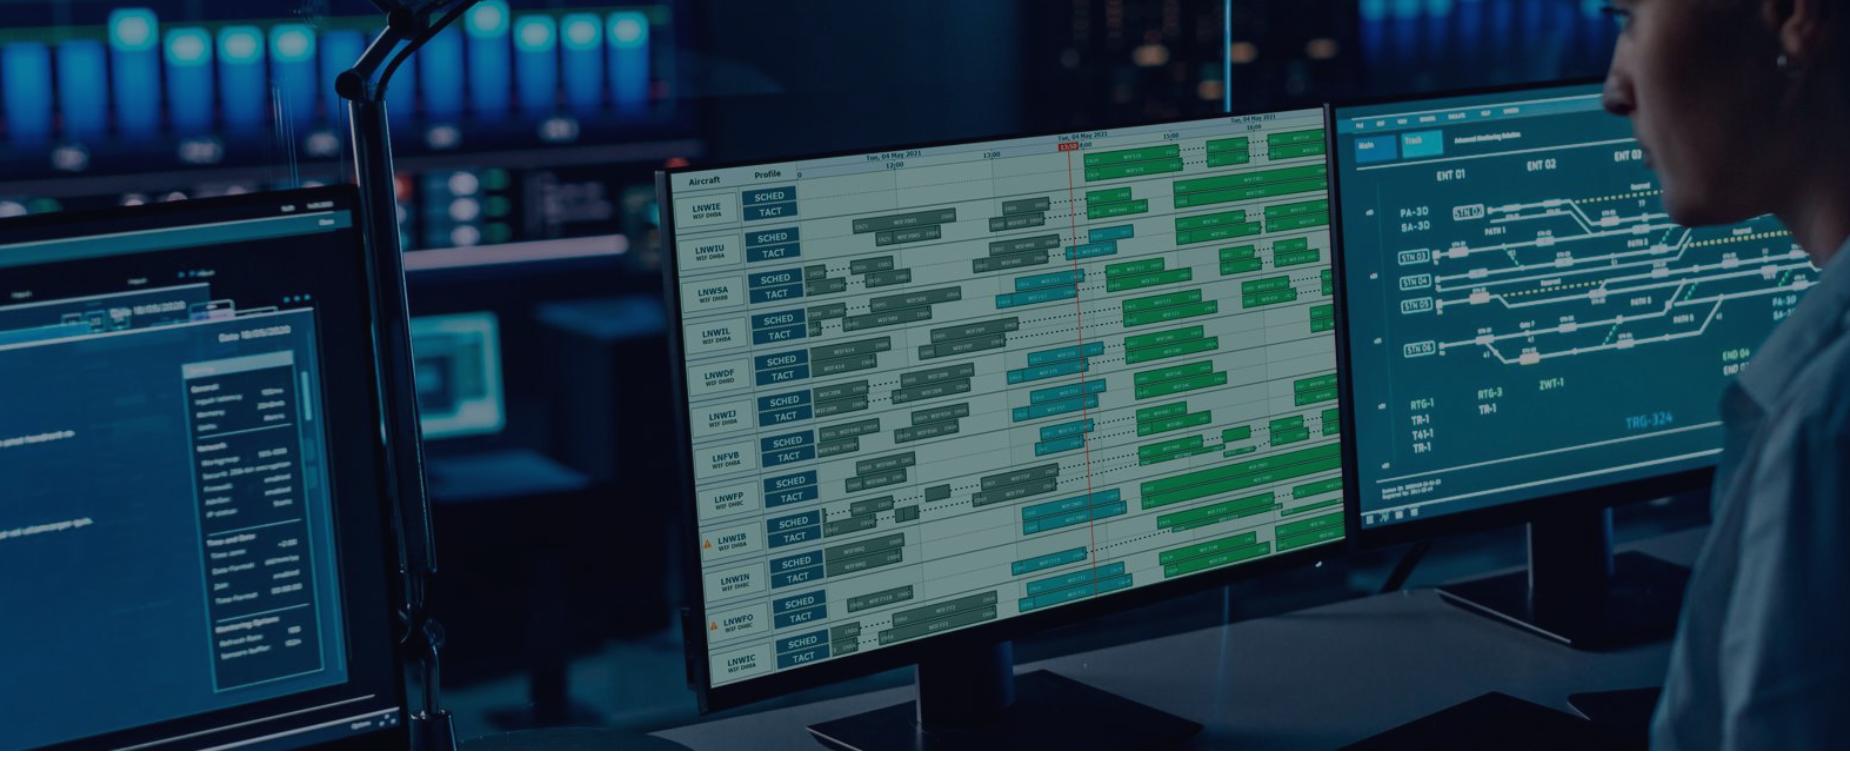 FoxATM - Eurocontrol